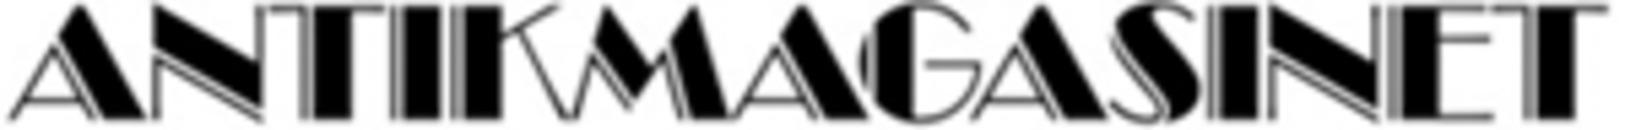 Antikmagasinet - Lampverkstad logo